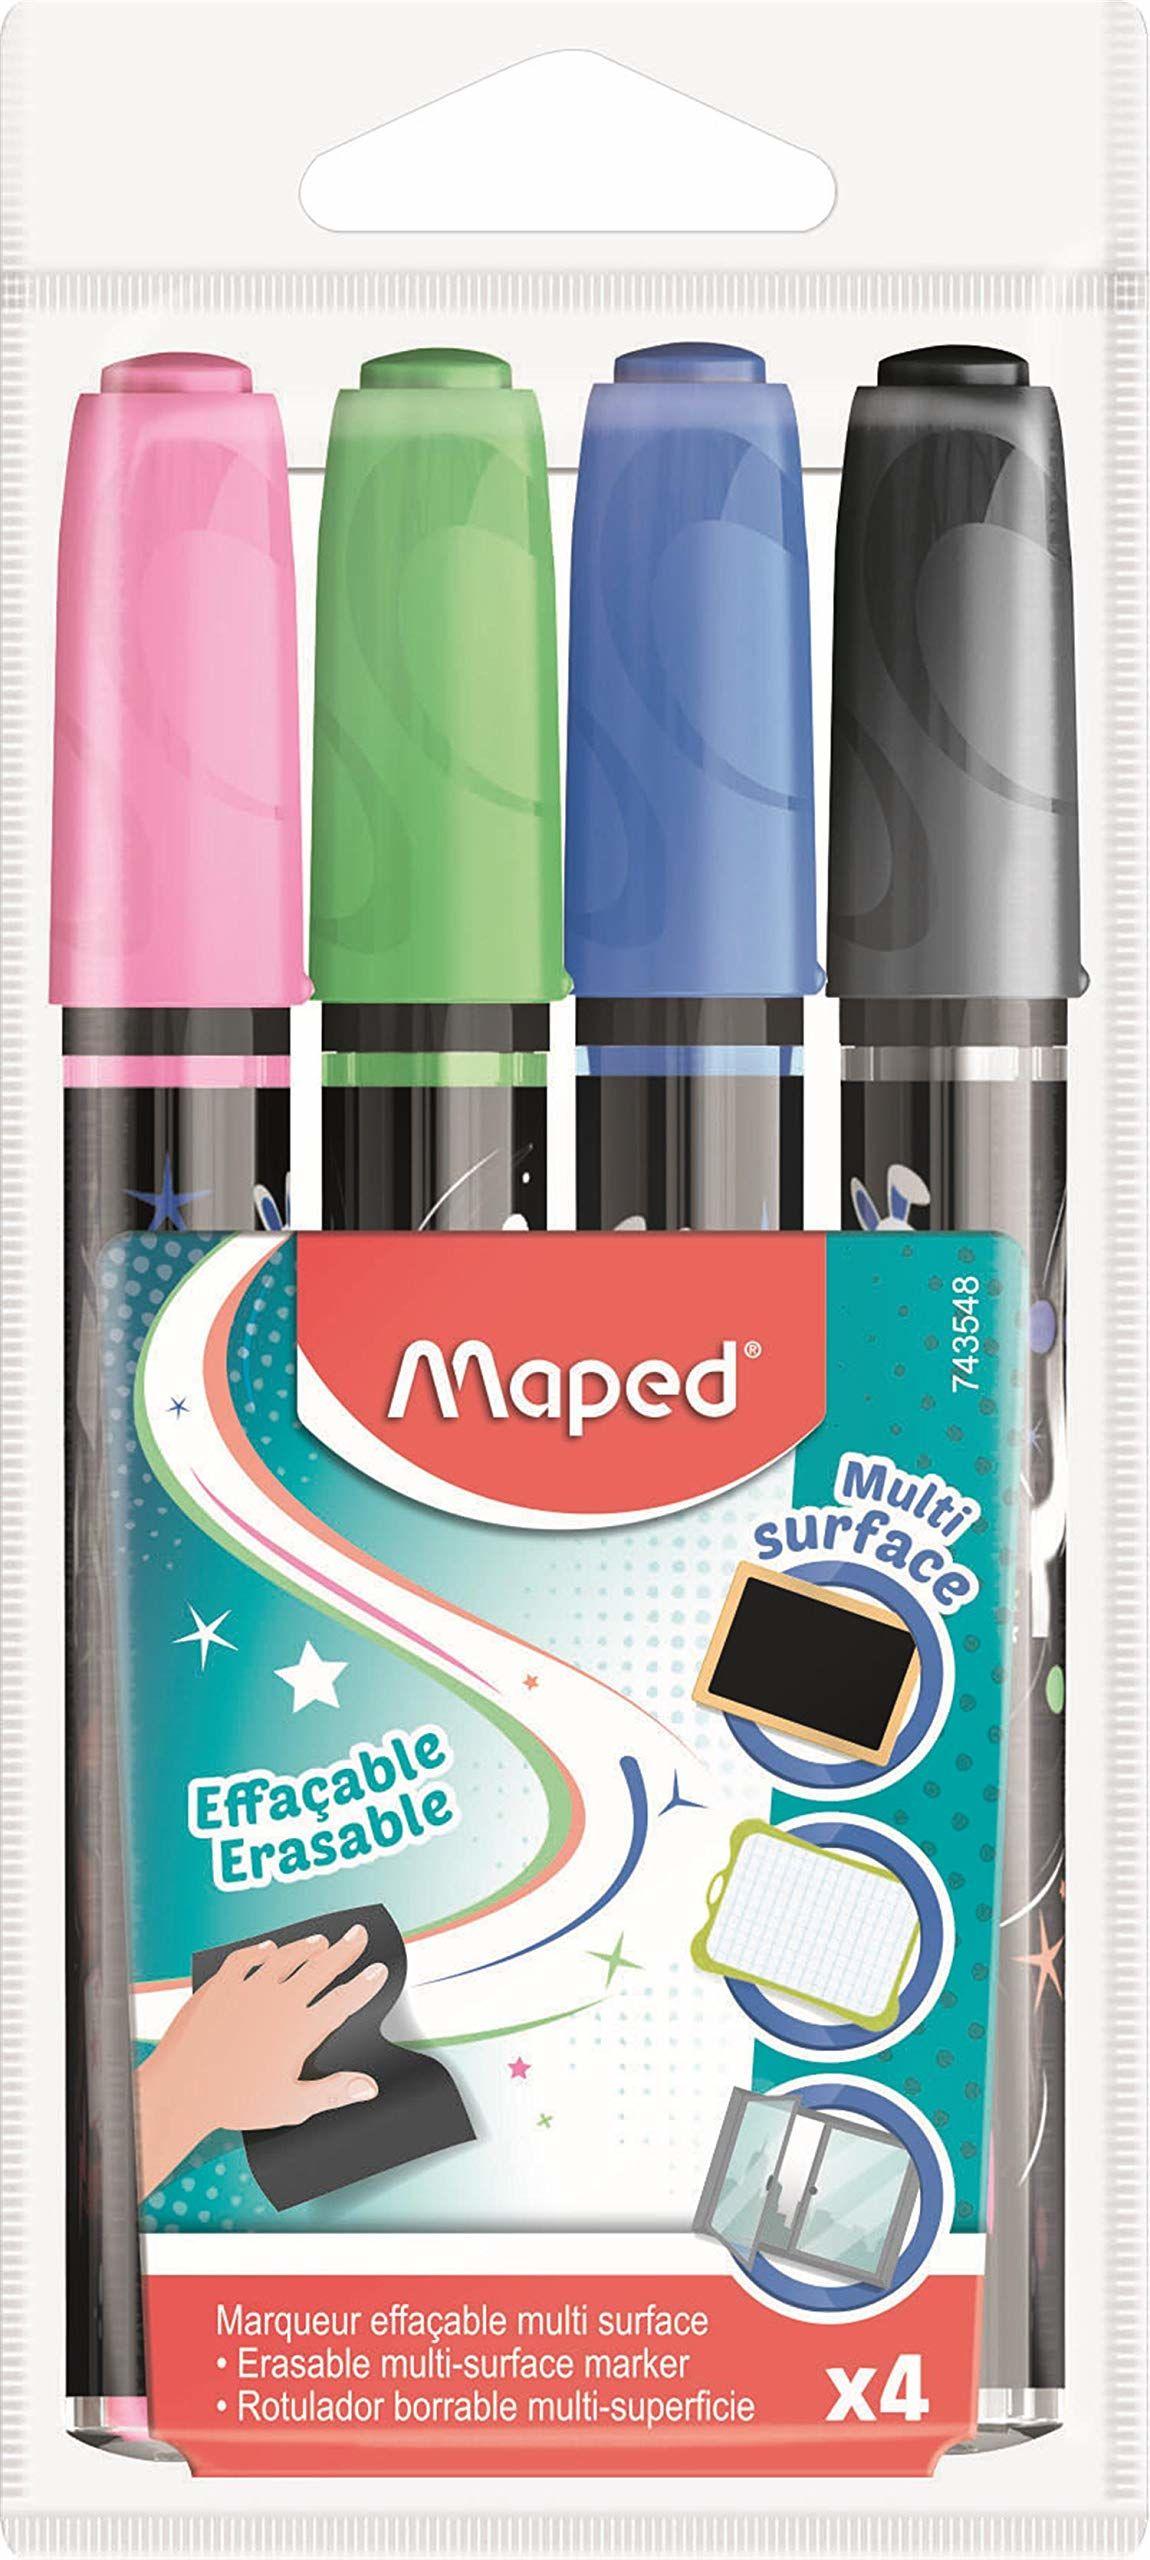 Mapedd 743548 kredki